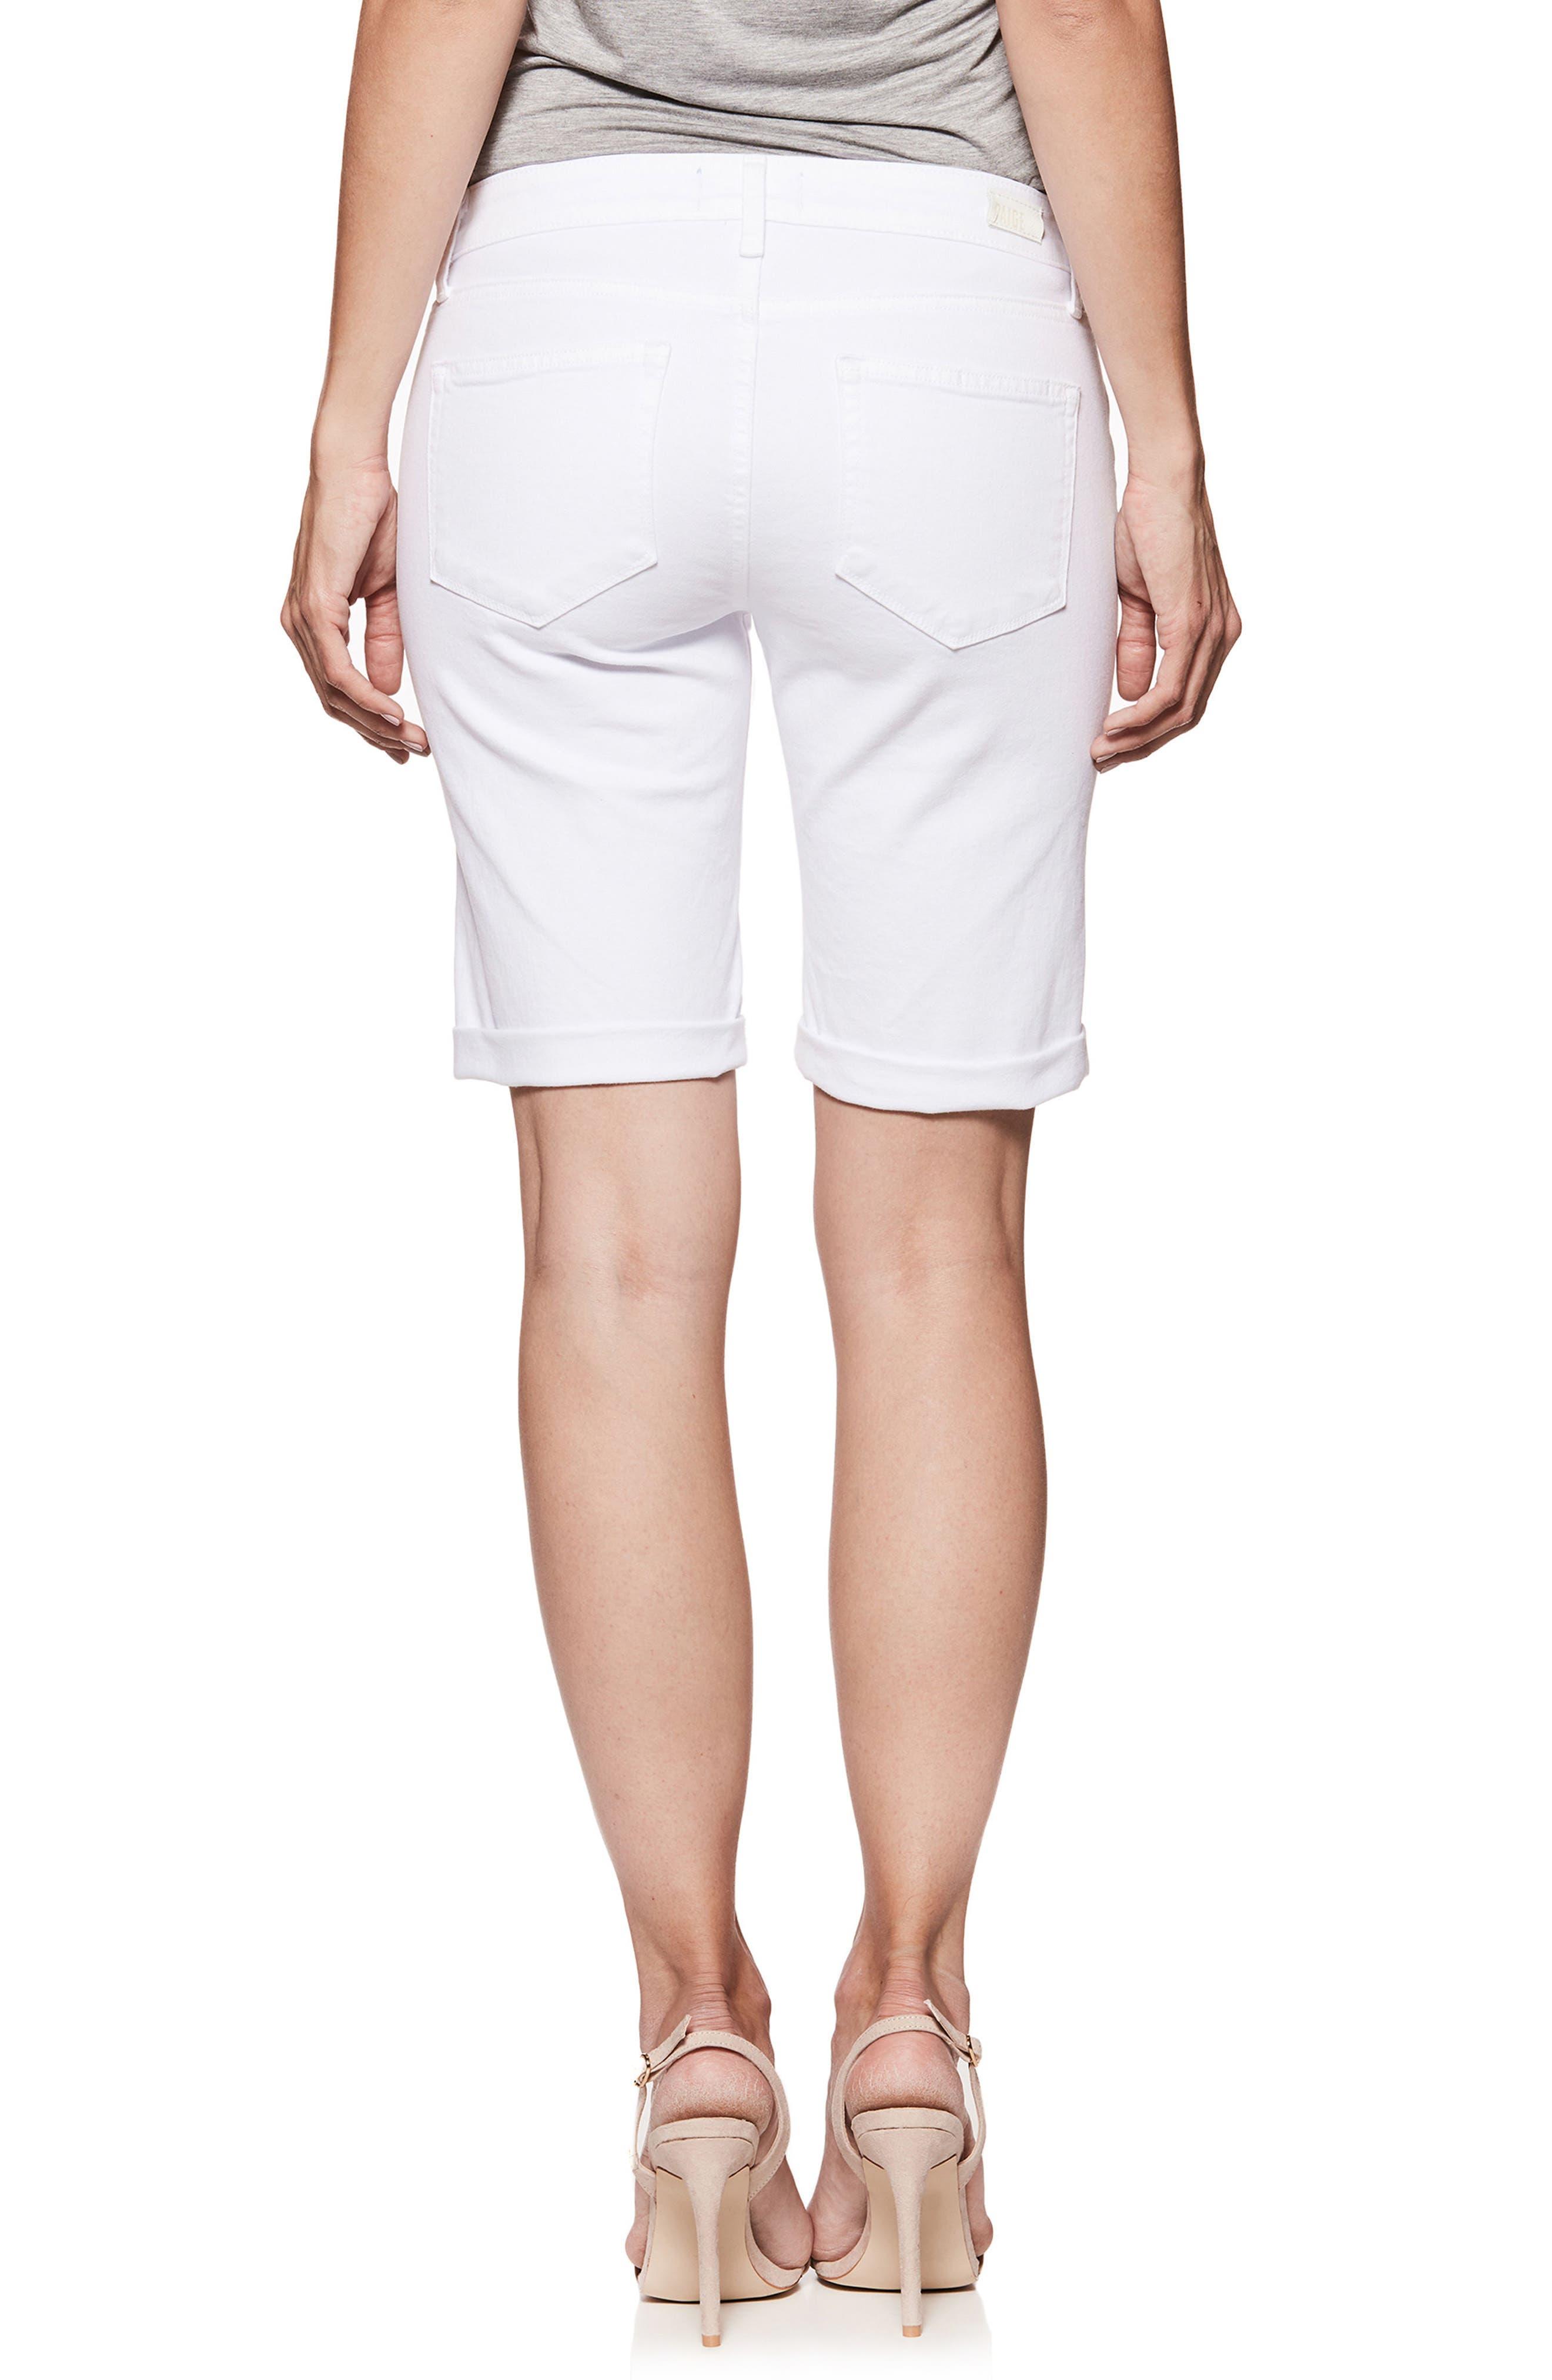 Jax Denim Bermuda Shorts,                             Alternate thumbnail 2, color,                             CRISP WHITE